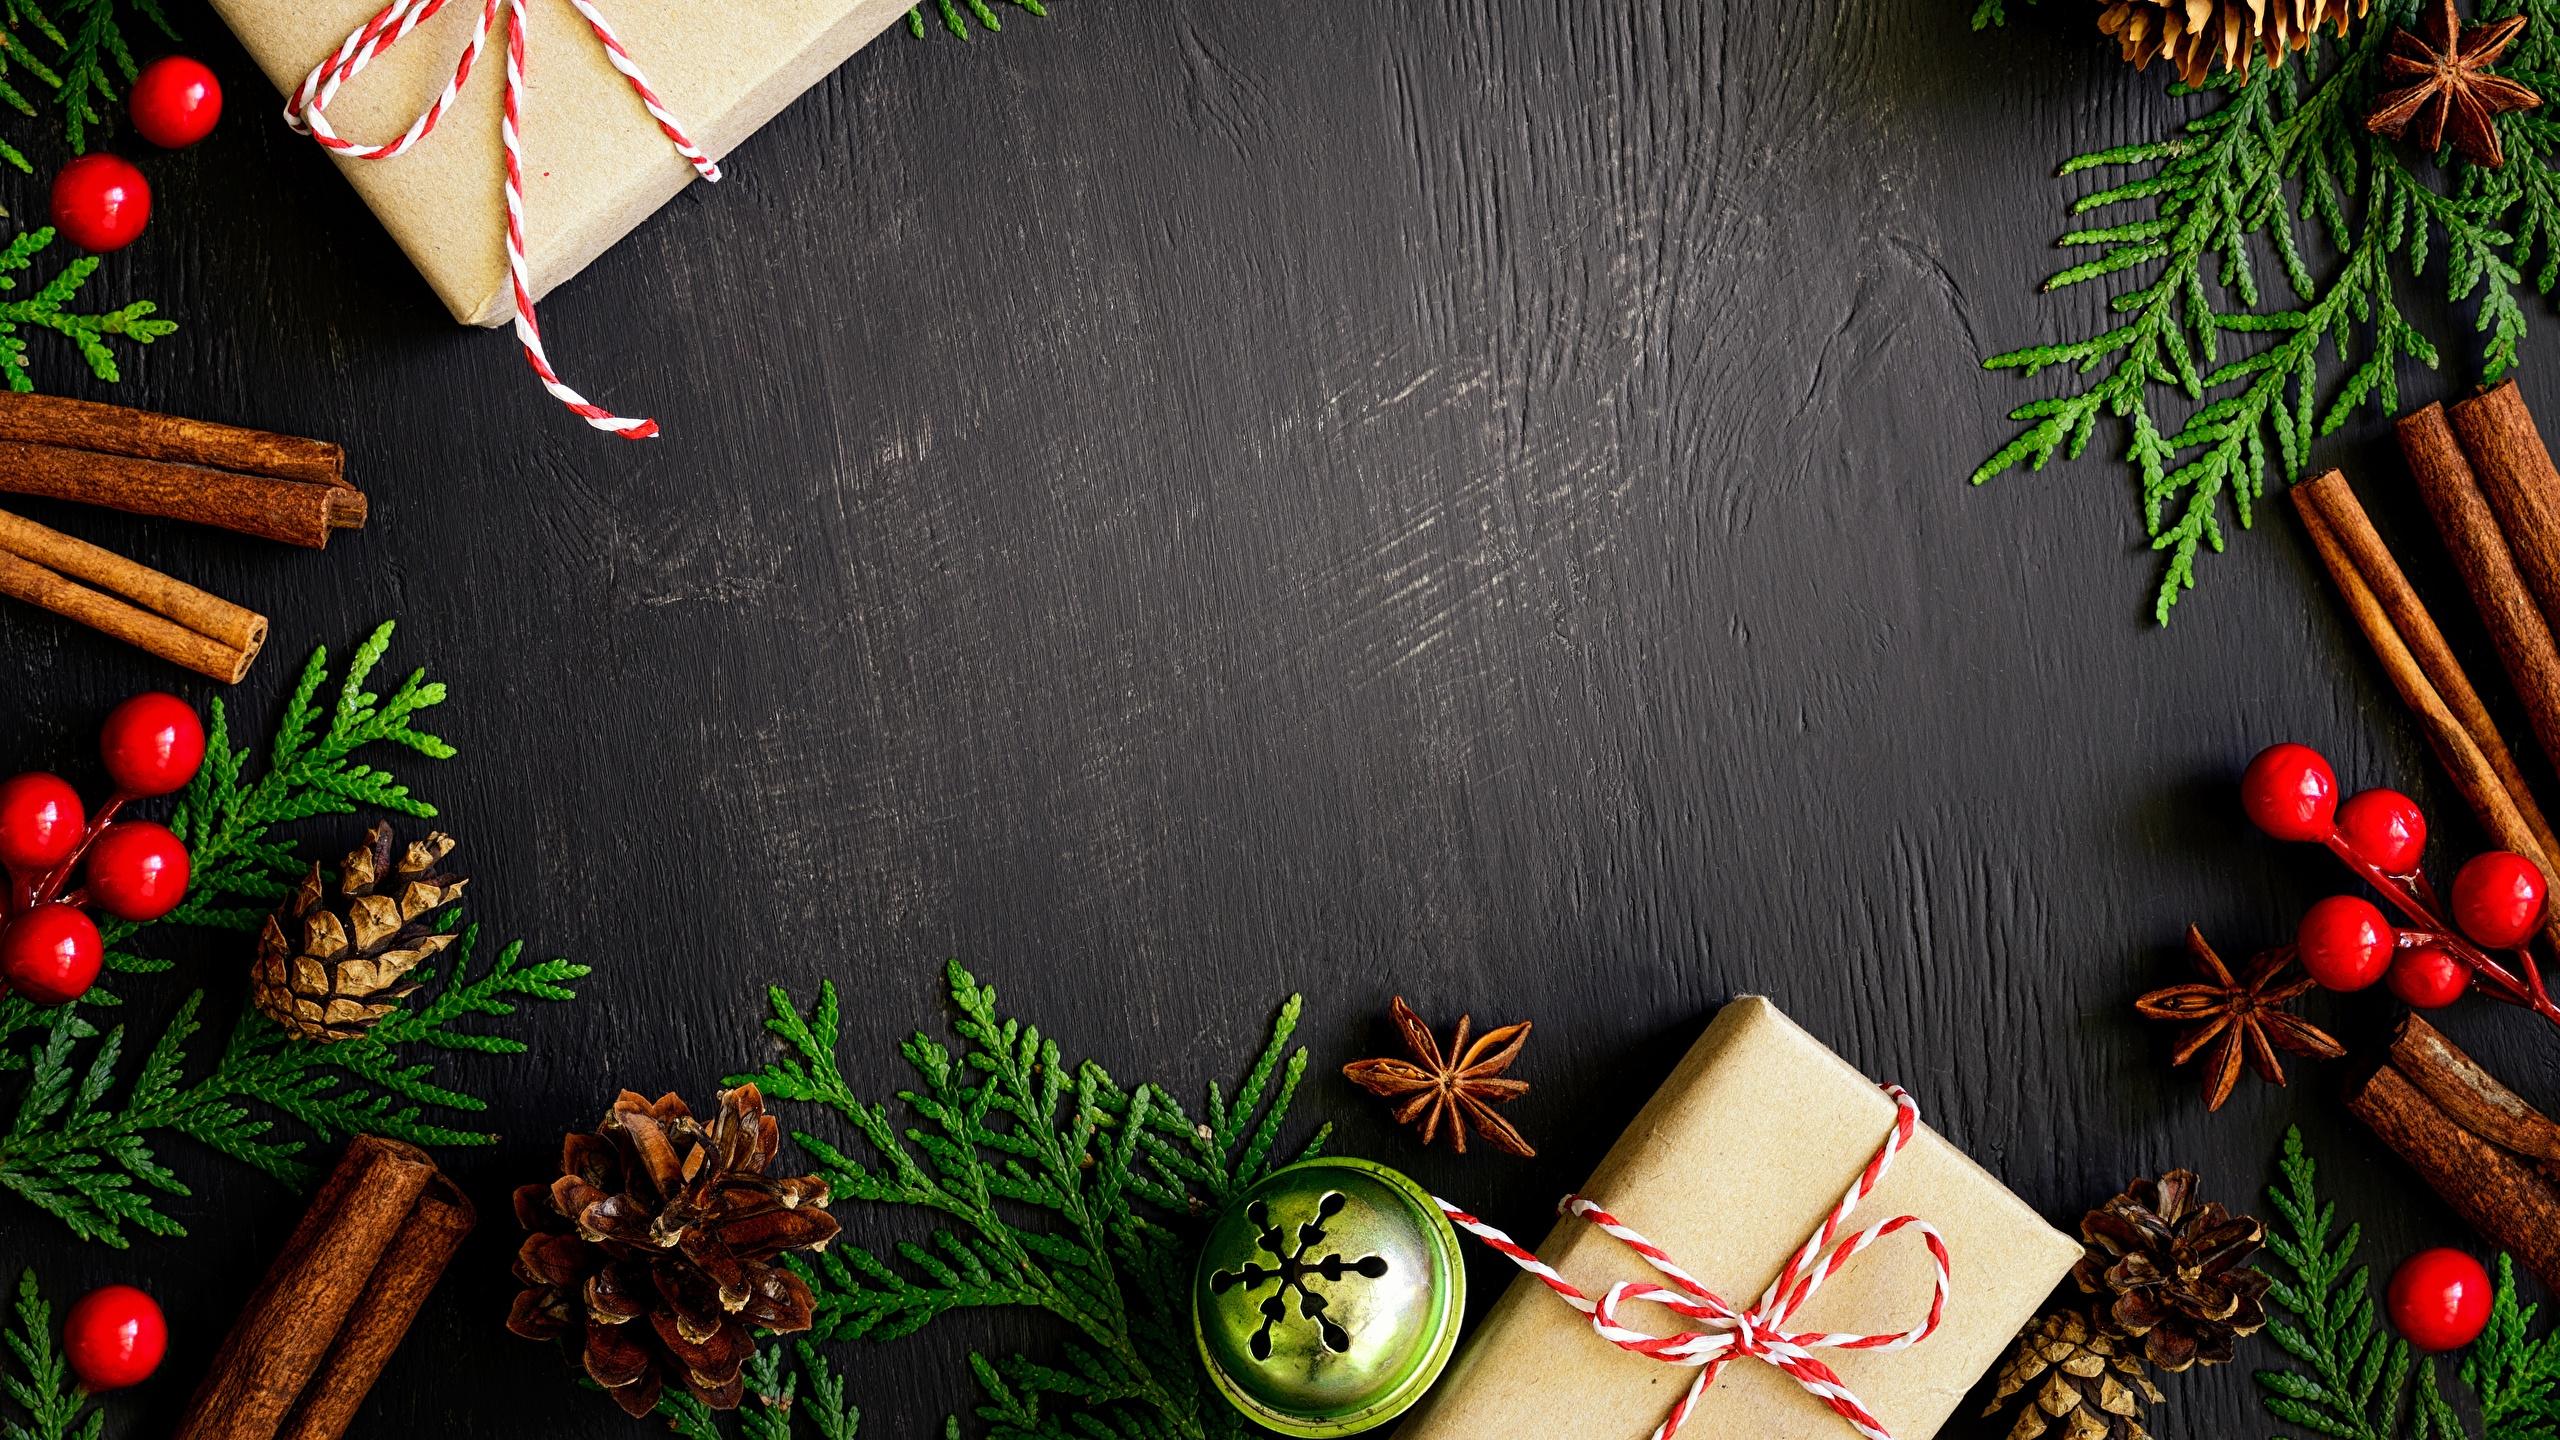 Desktop Wallpapers Christmas Present Conifer Cone Template 2560x1440